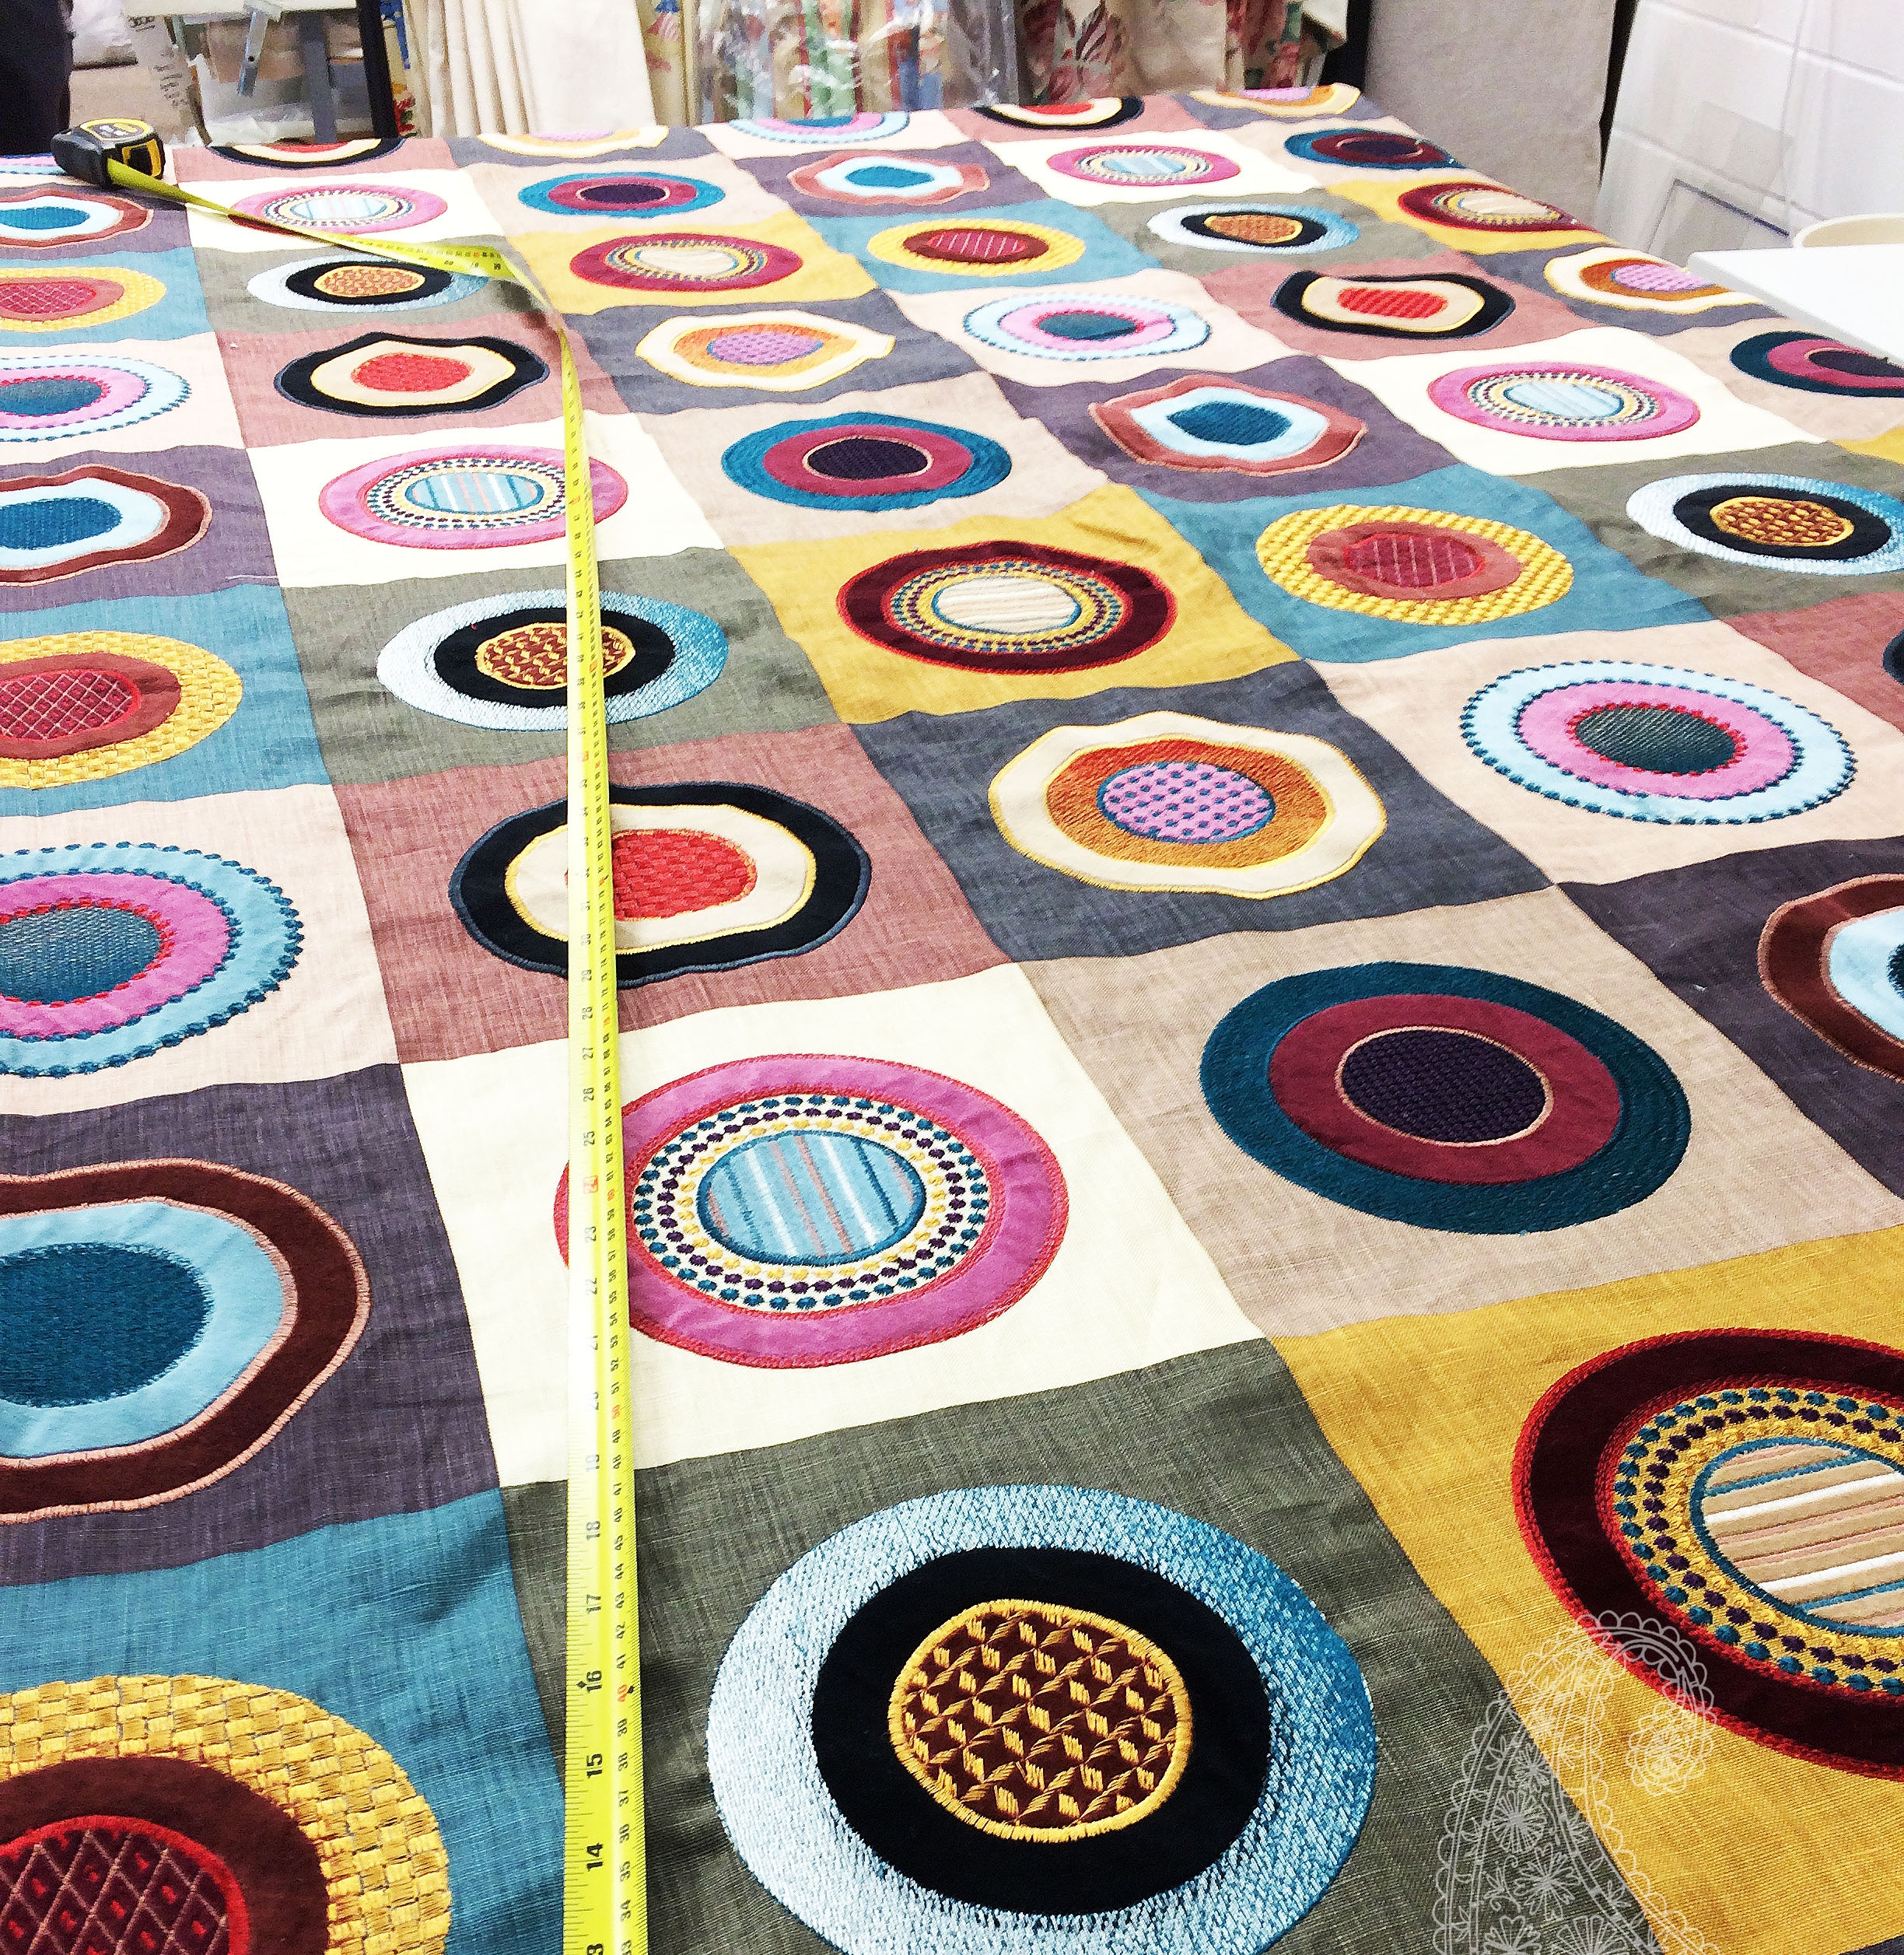 Mulberry fabric Dress Circle Pippa Rolls Limited jpeg.jpg